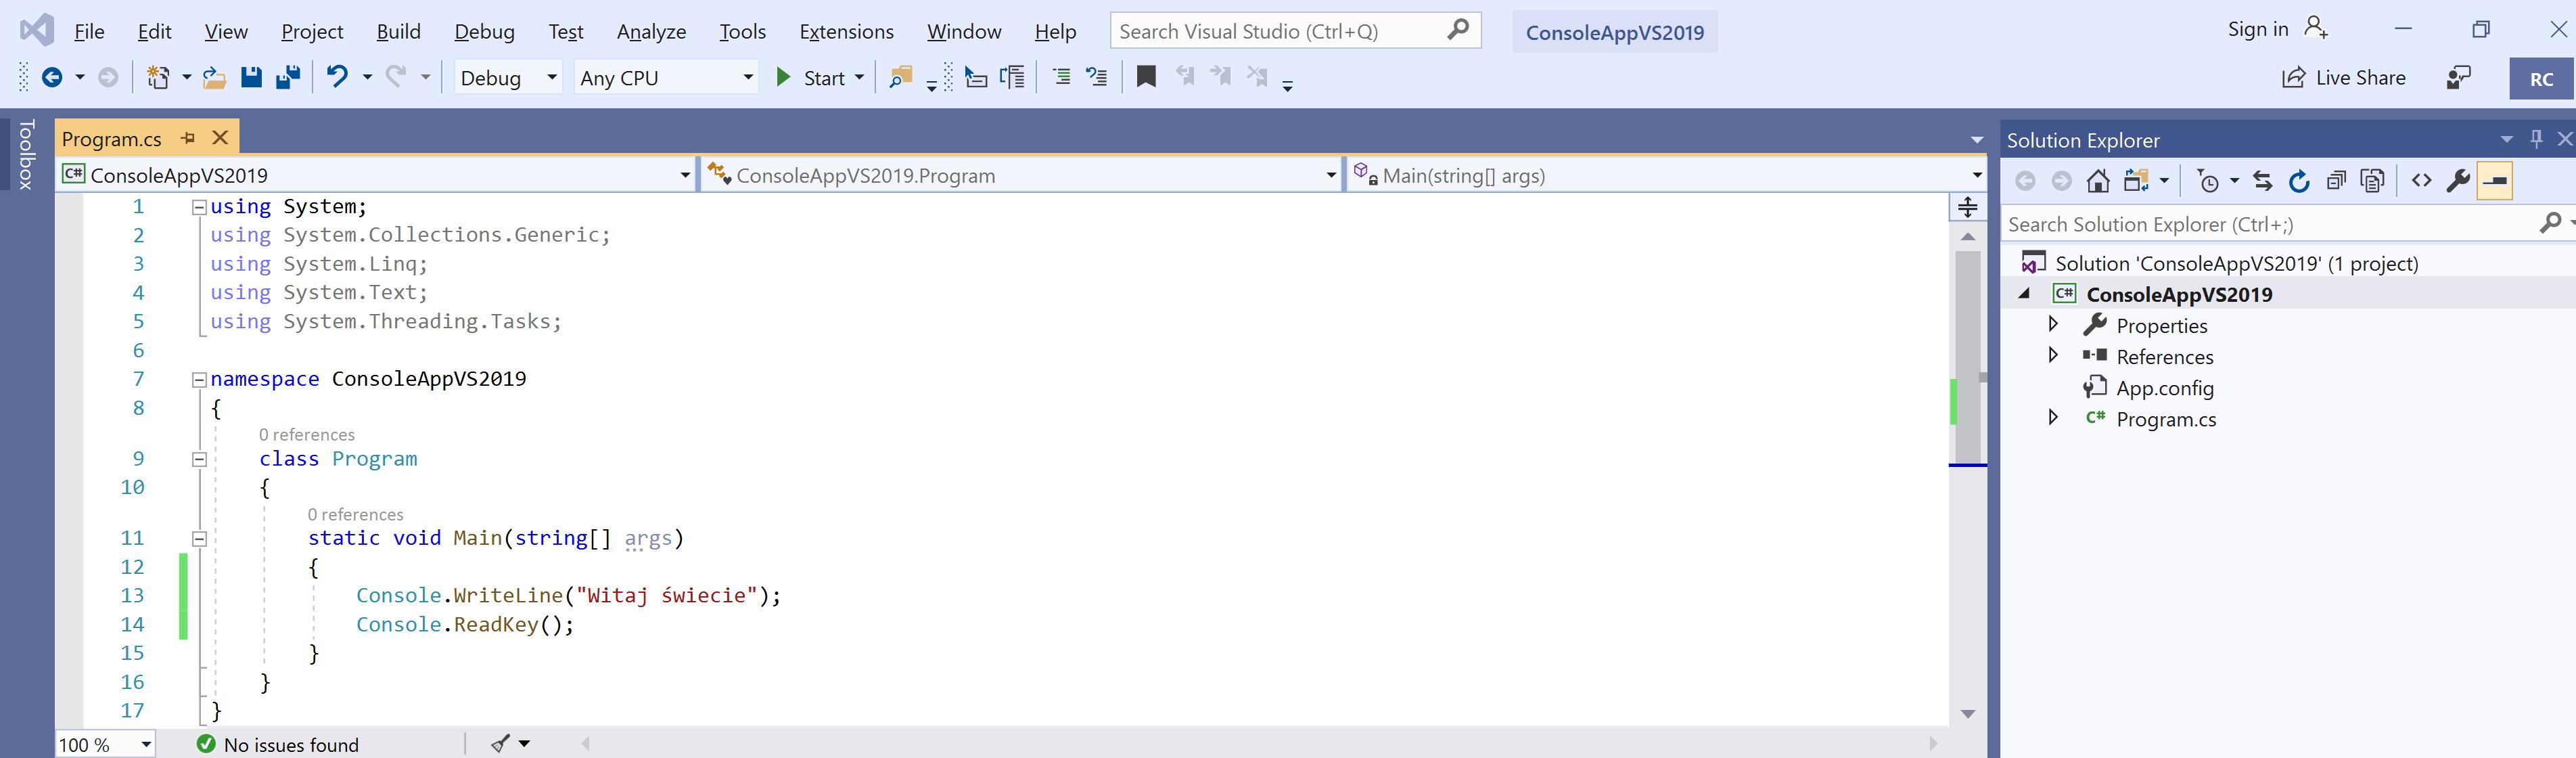 Instalacja Visual Studio 2019 Community Edition